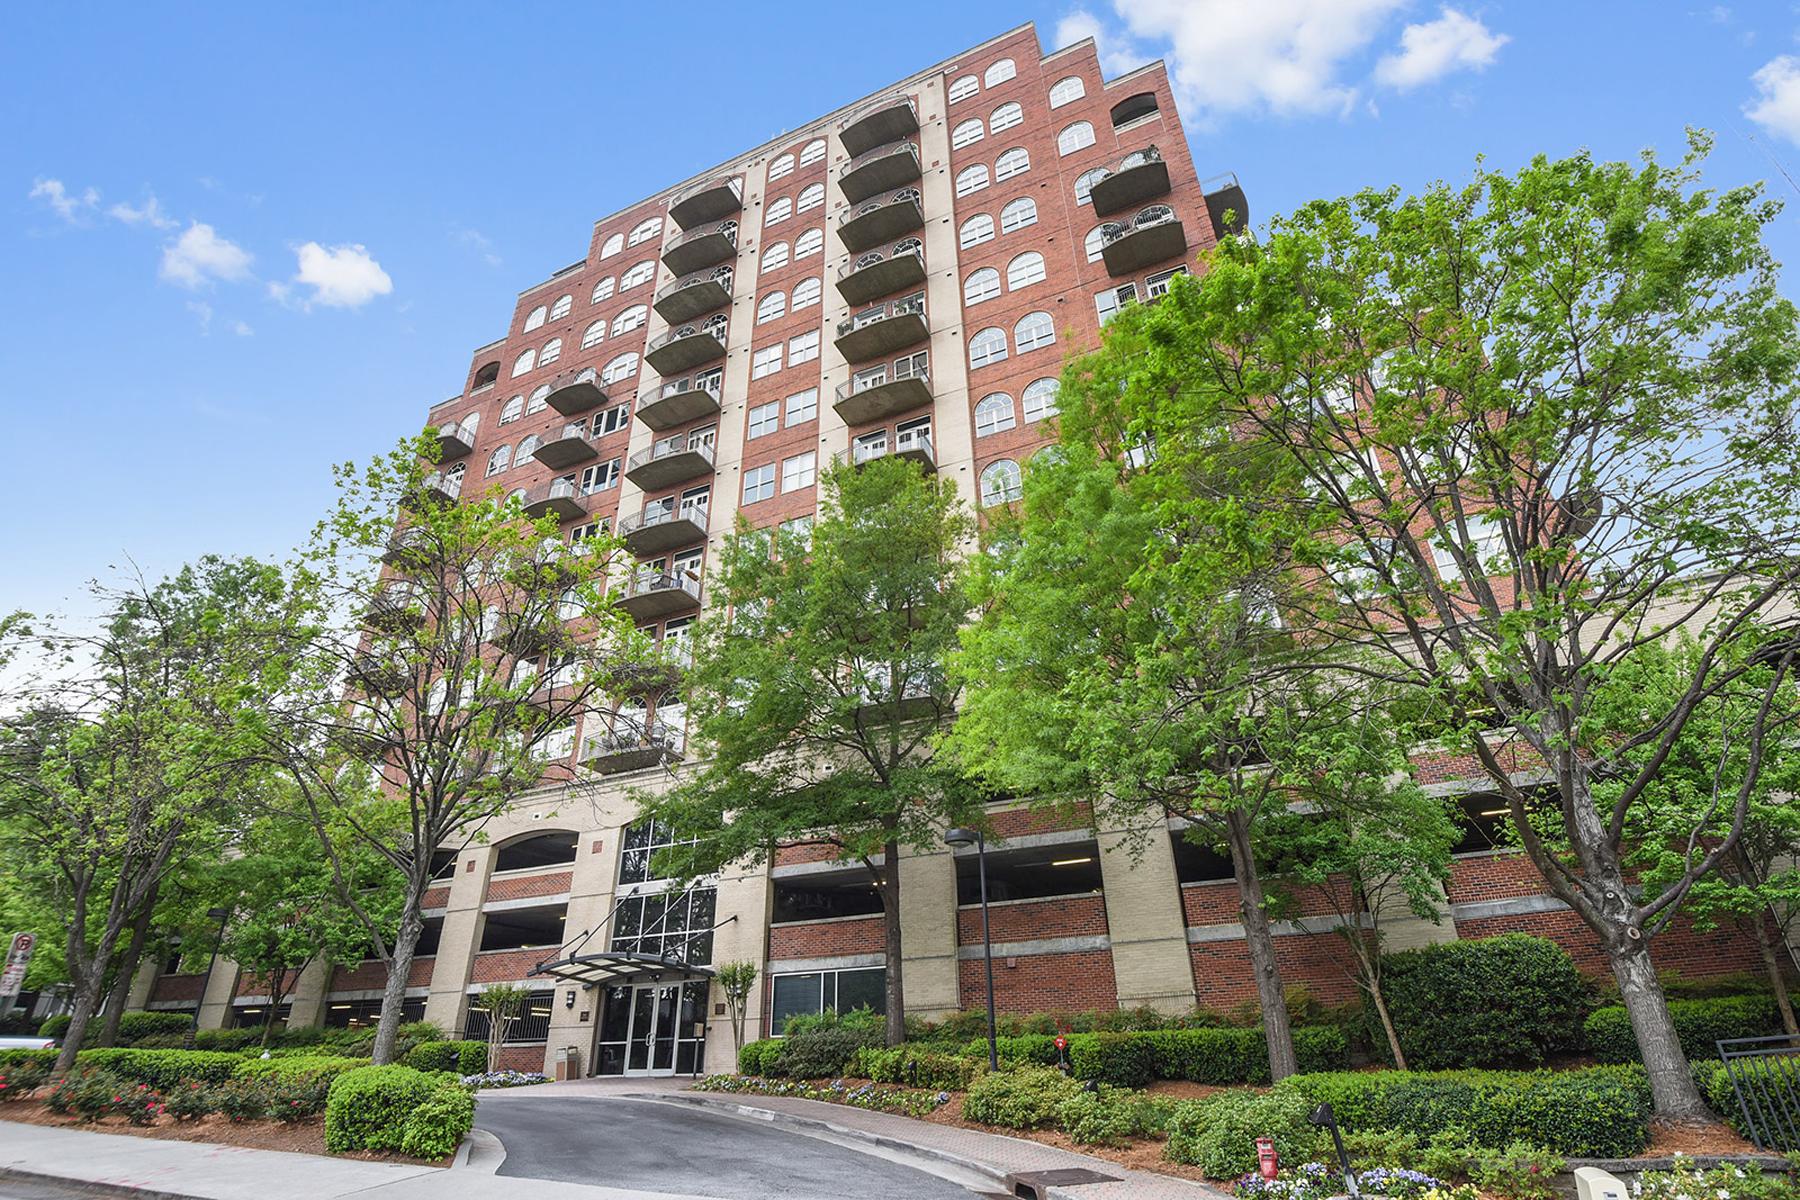 Condominio por un Venta en Stunning Loft In The Heart Of Buckhead 3180 Mathieson Drive NE Unit 605 Atlanta, Georgia, 30305 Estados Unidos